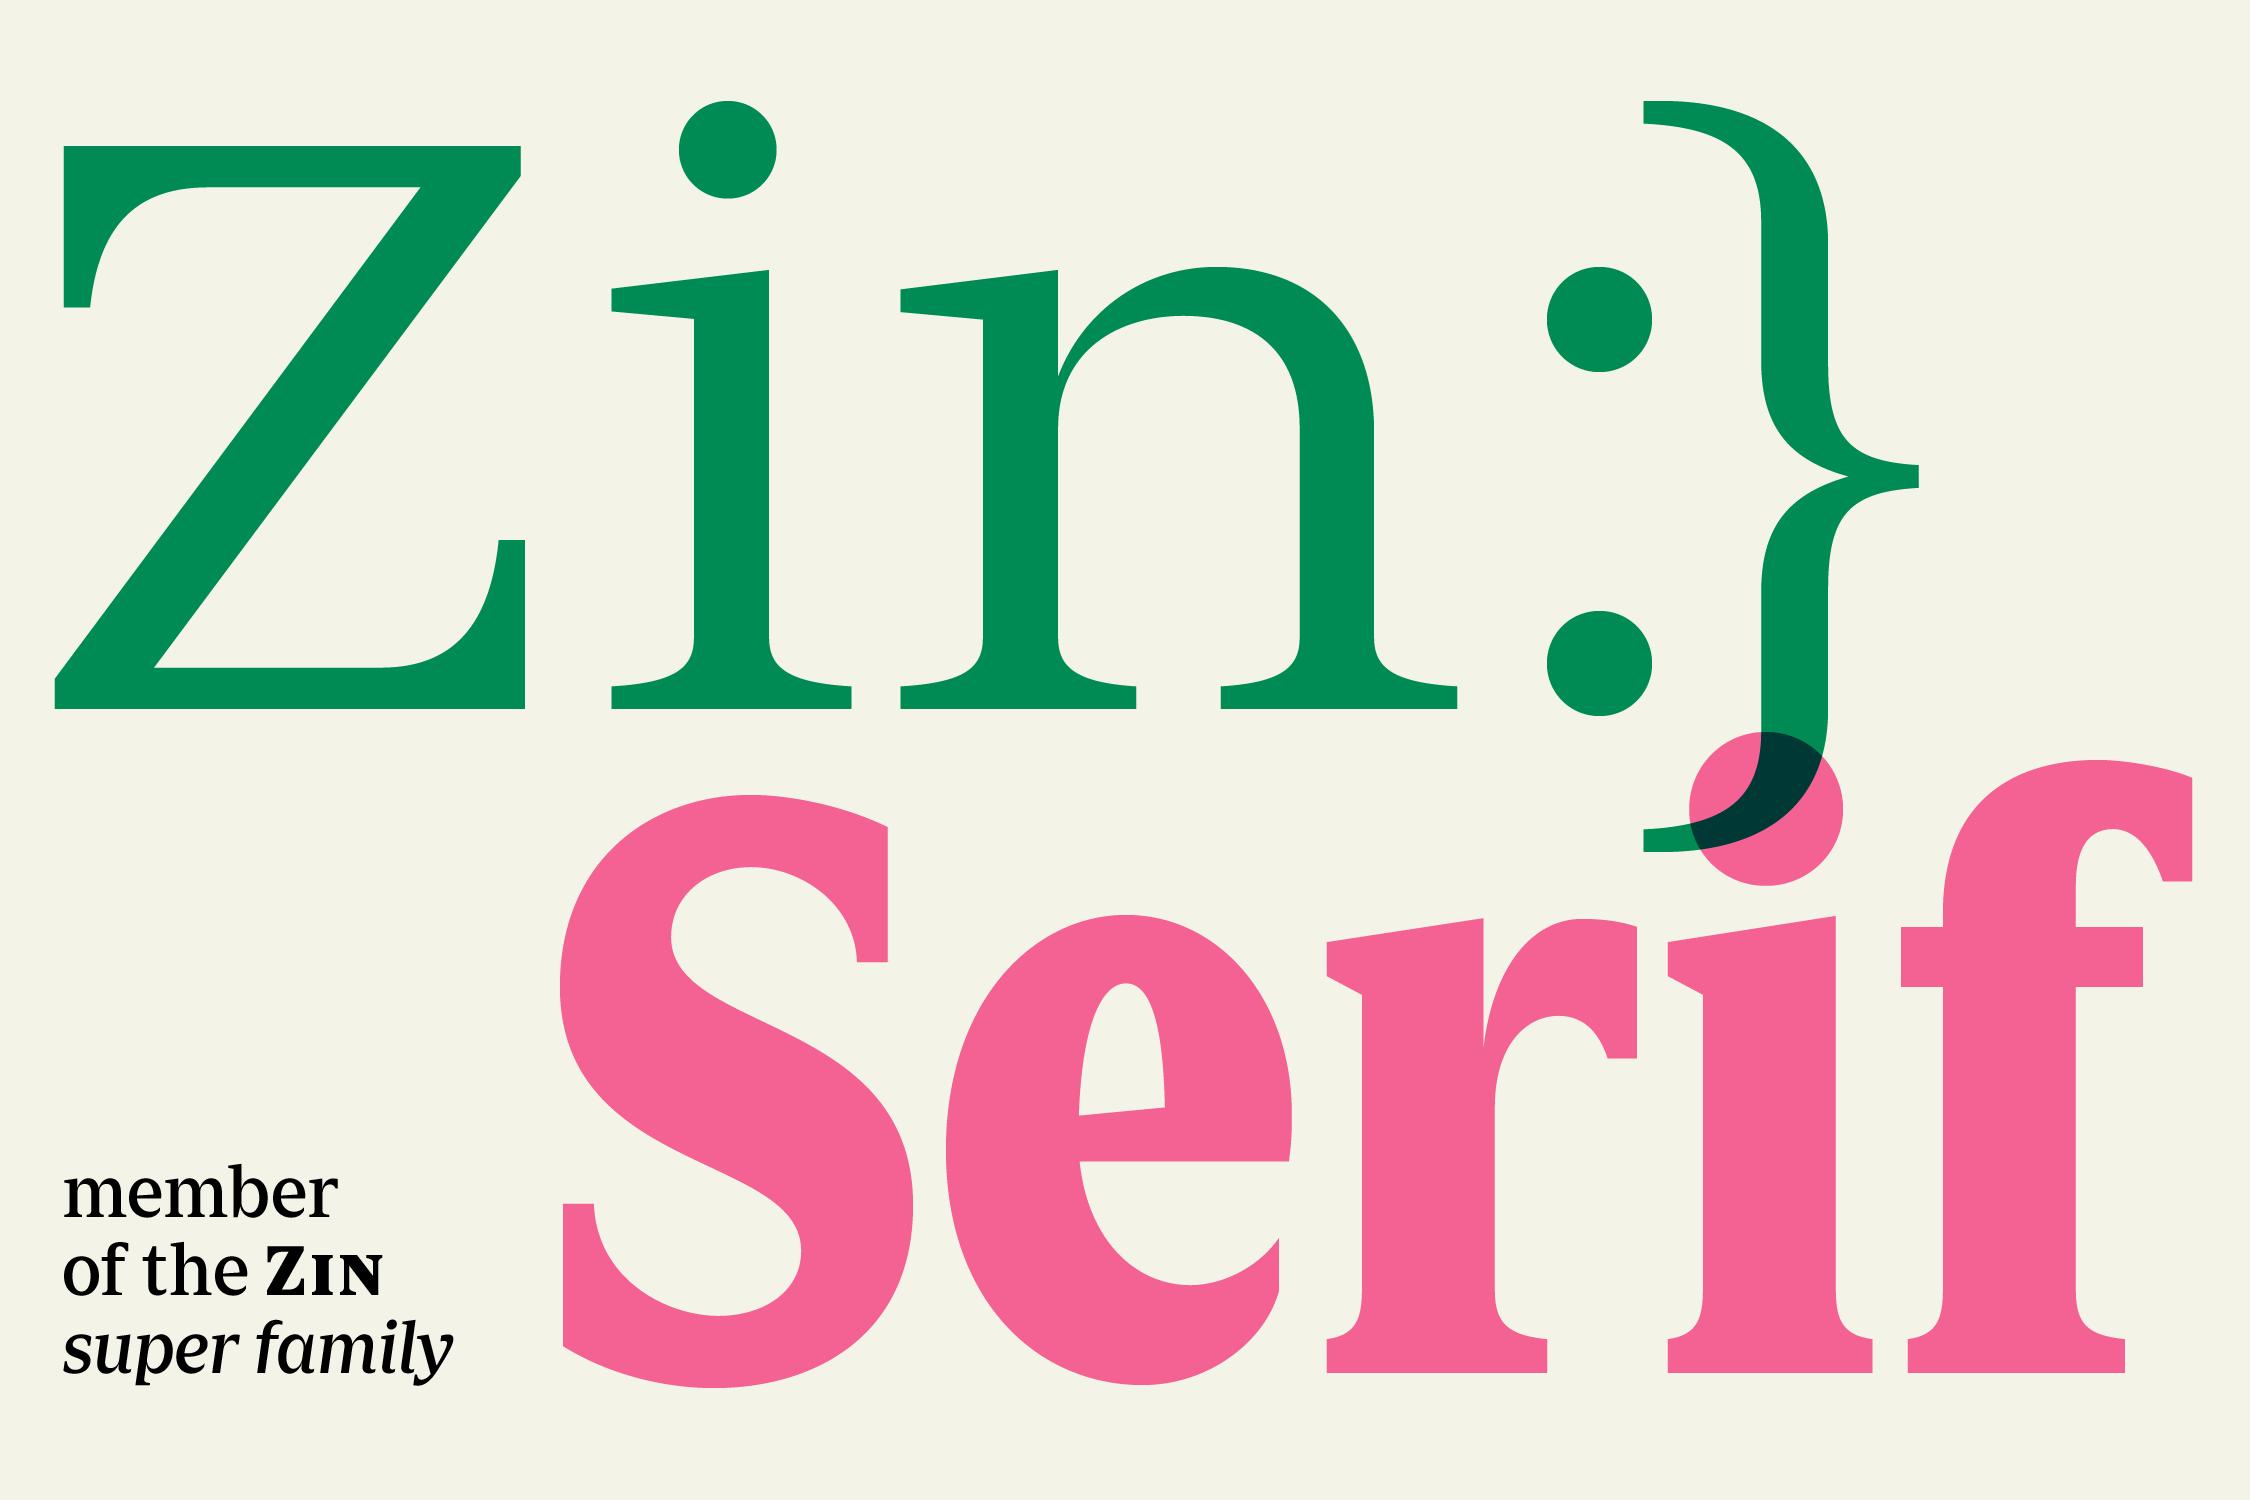 ZinSerif-01.png